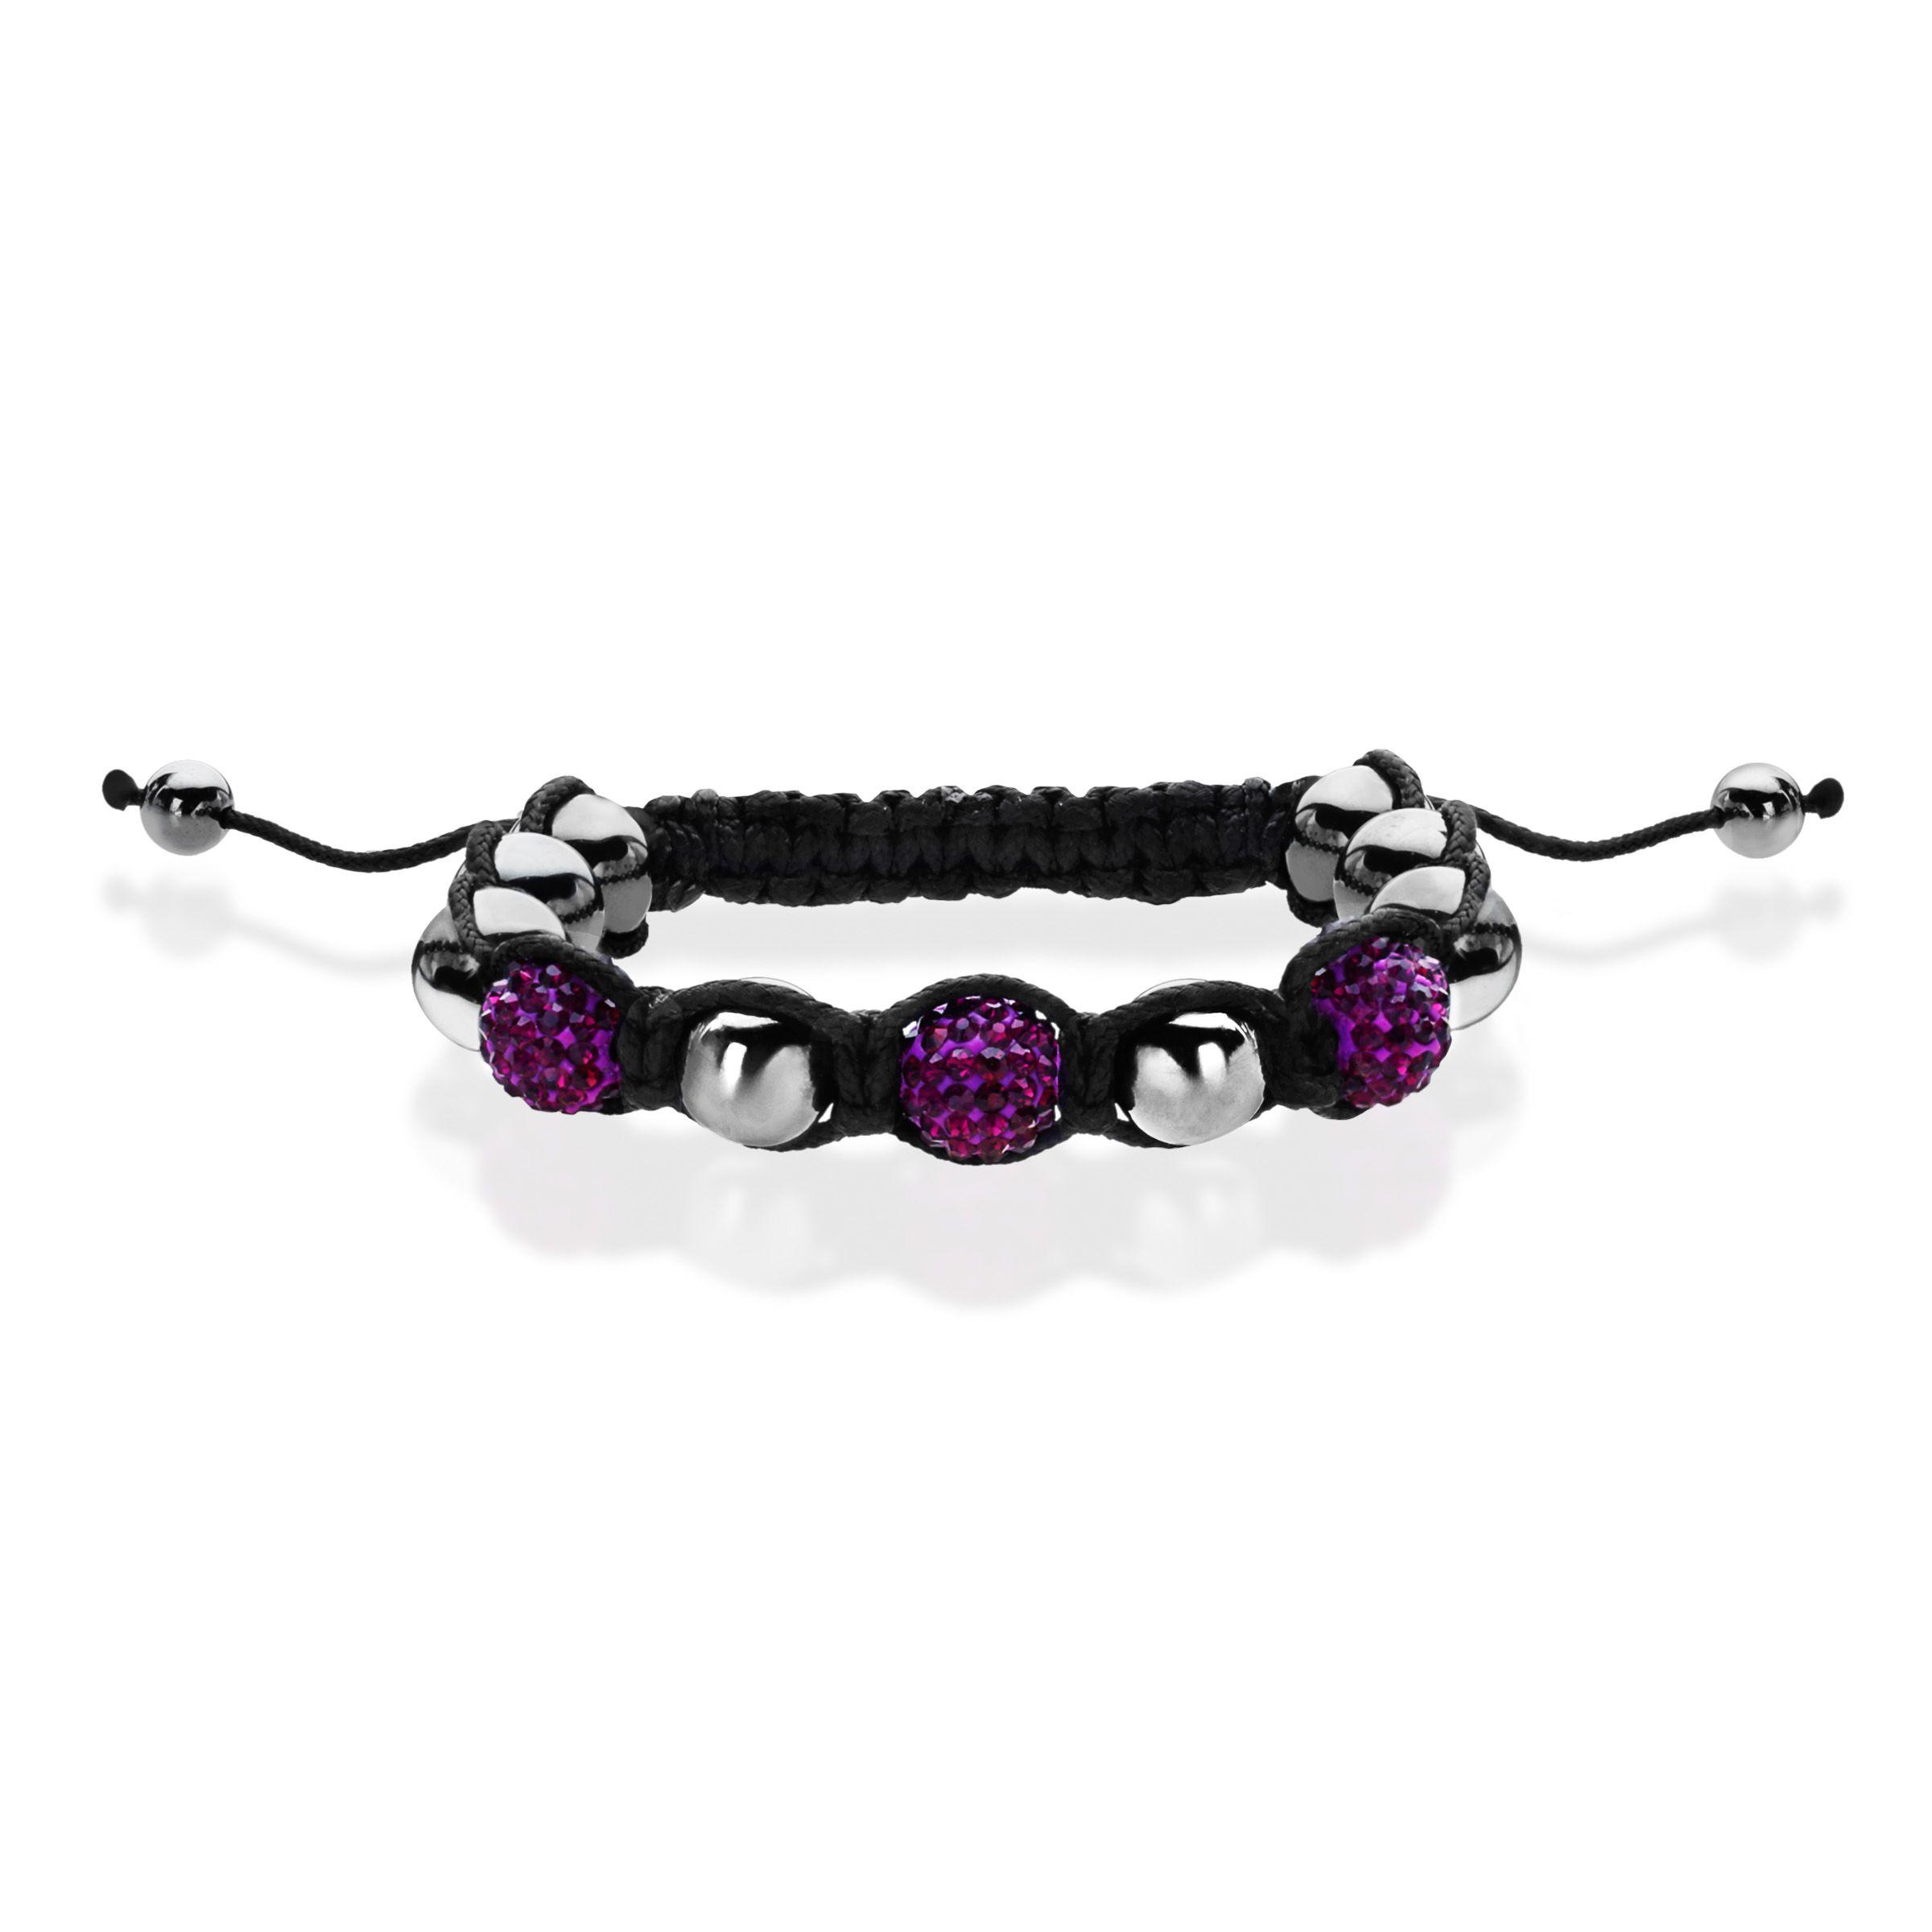 Aya Azrielant Shamballa Bead Bracelet with Purple Crystal, Hematite & Starfish Charm from Jewelry.com